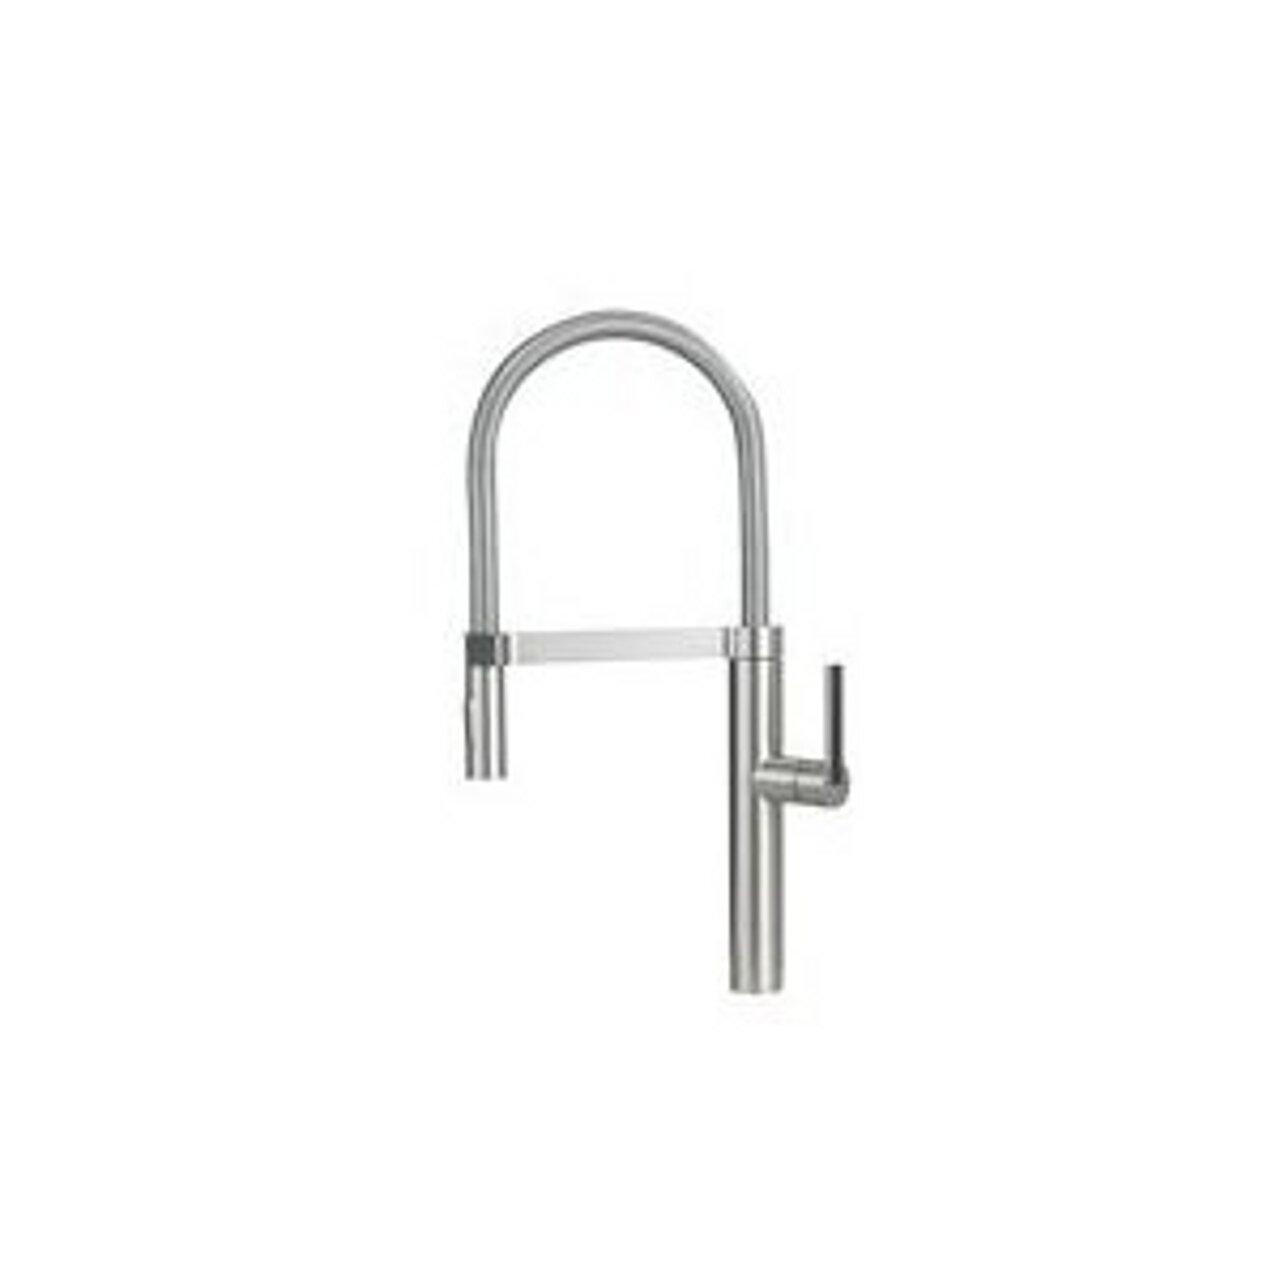 Blanco 441407 1.8 GPM Culina Semi-Pro Faucet, Satin Nickel